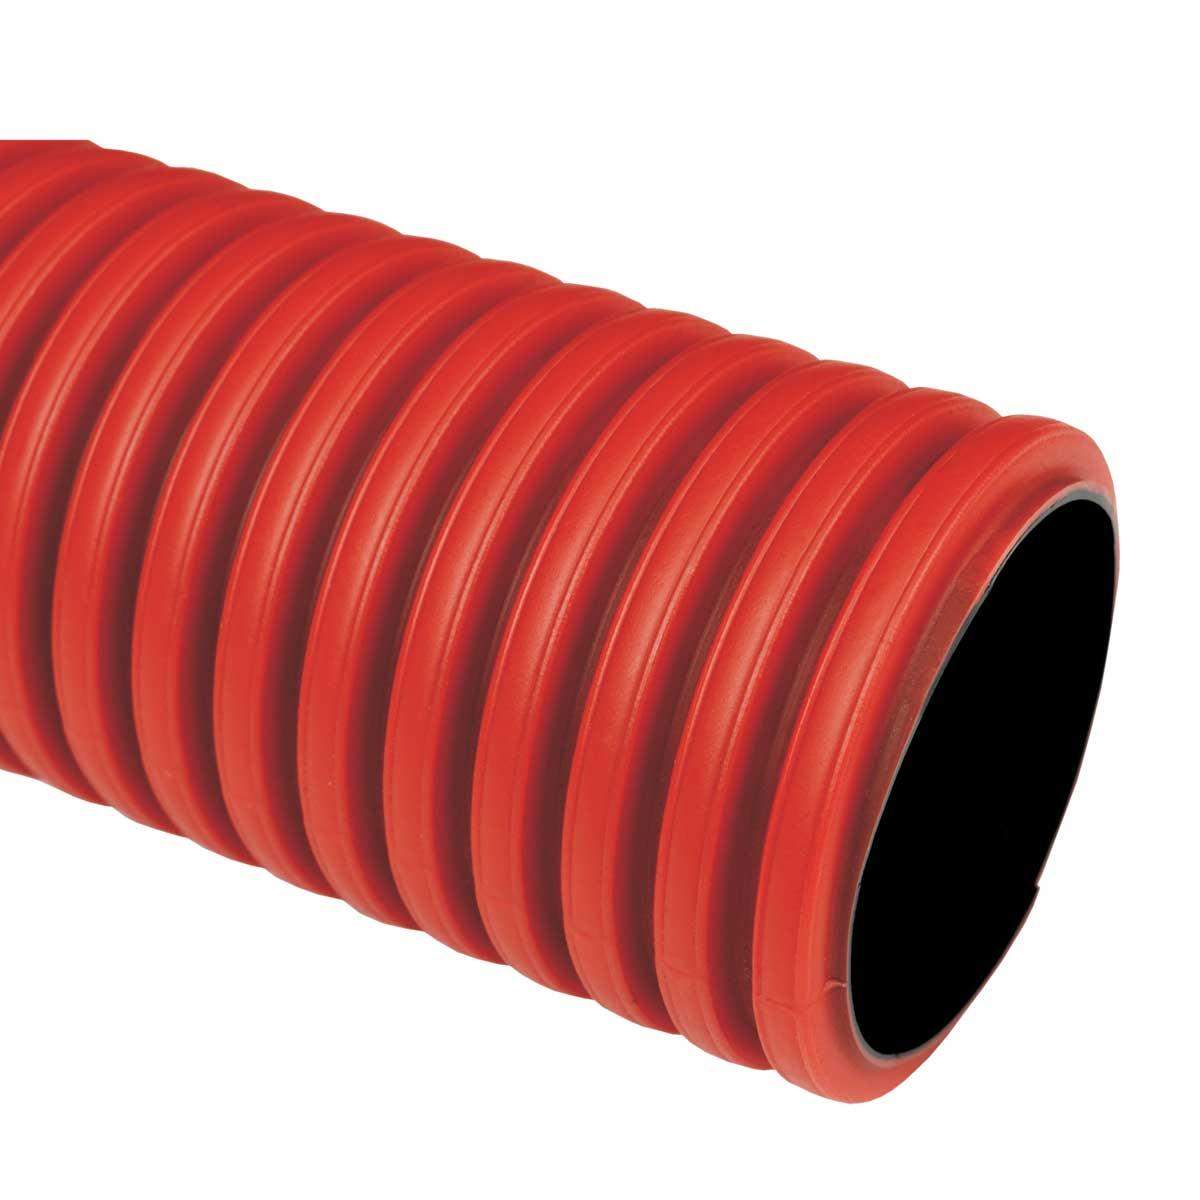 Труба гофрована жорстка двошарова Коподур, червона, протяжка, ; Ø110мм; поліетилен HDPE; довжина 6 м